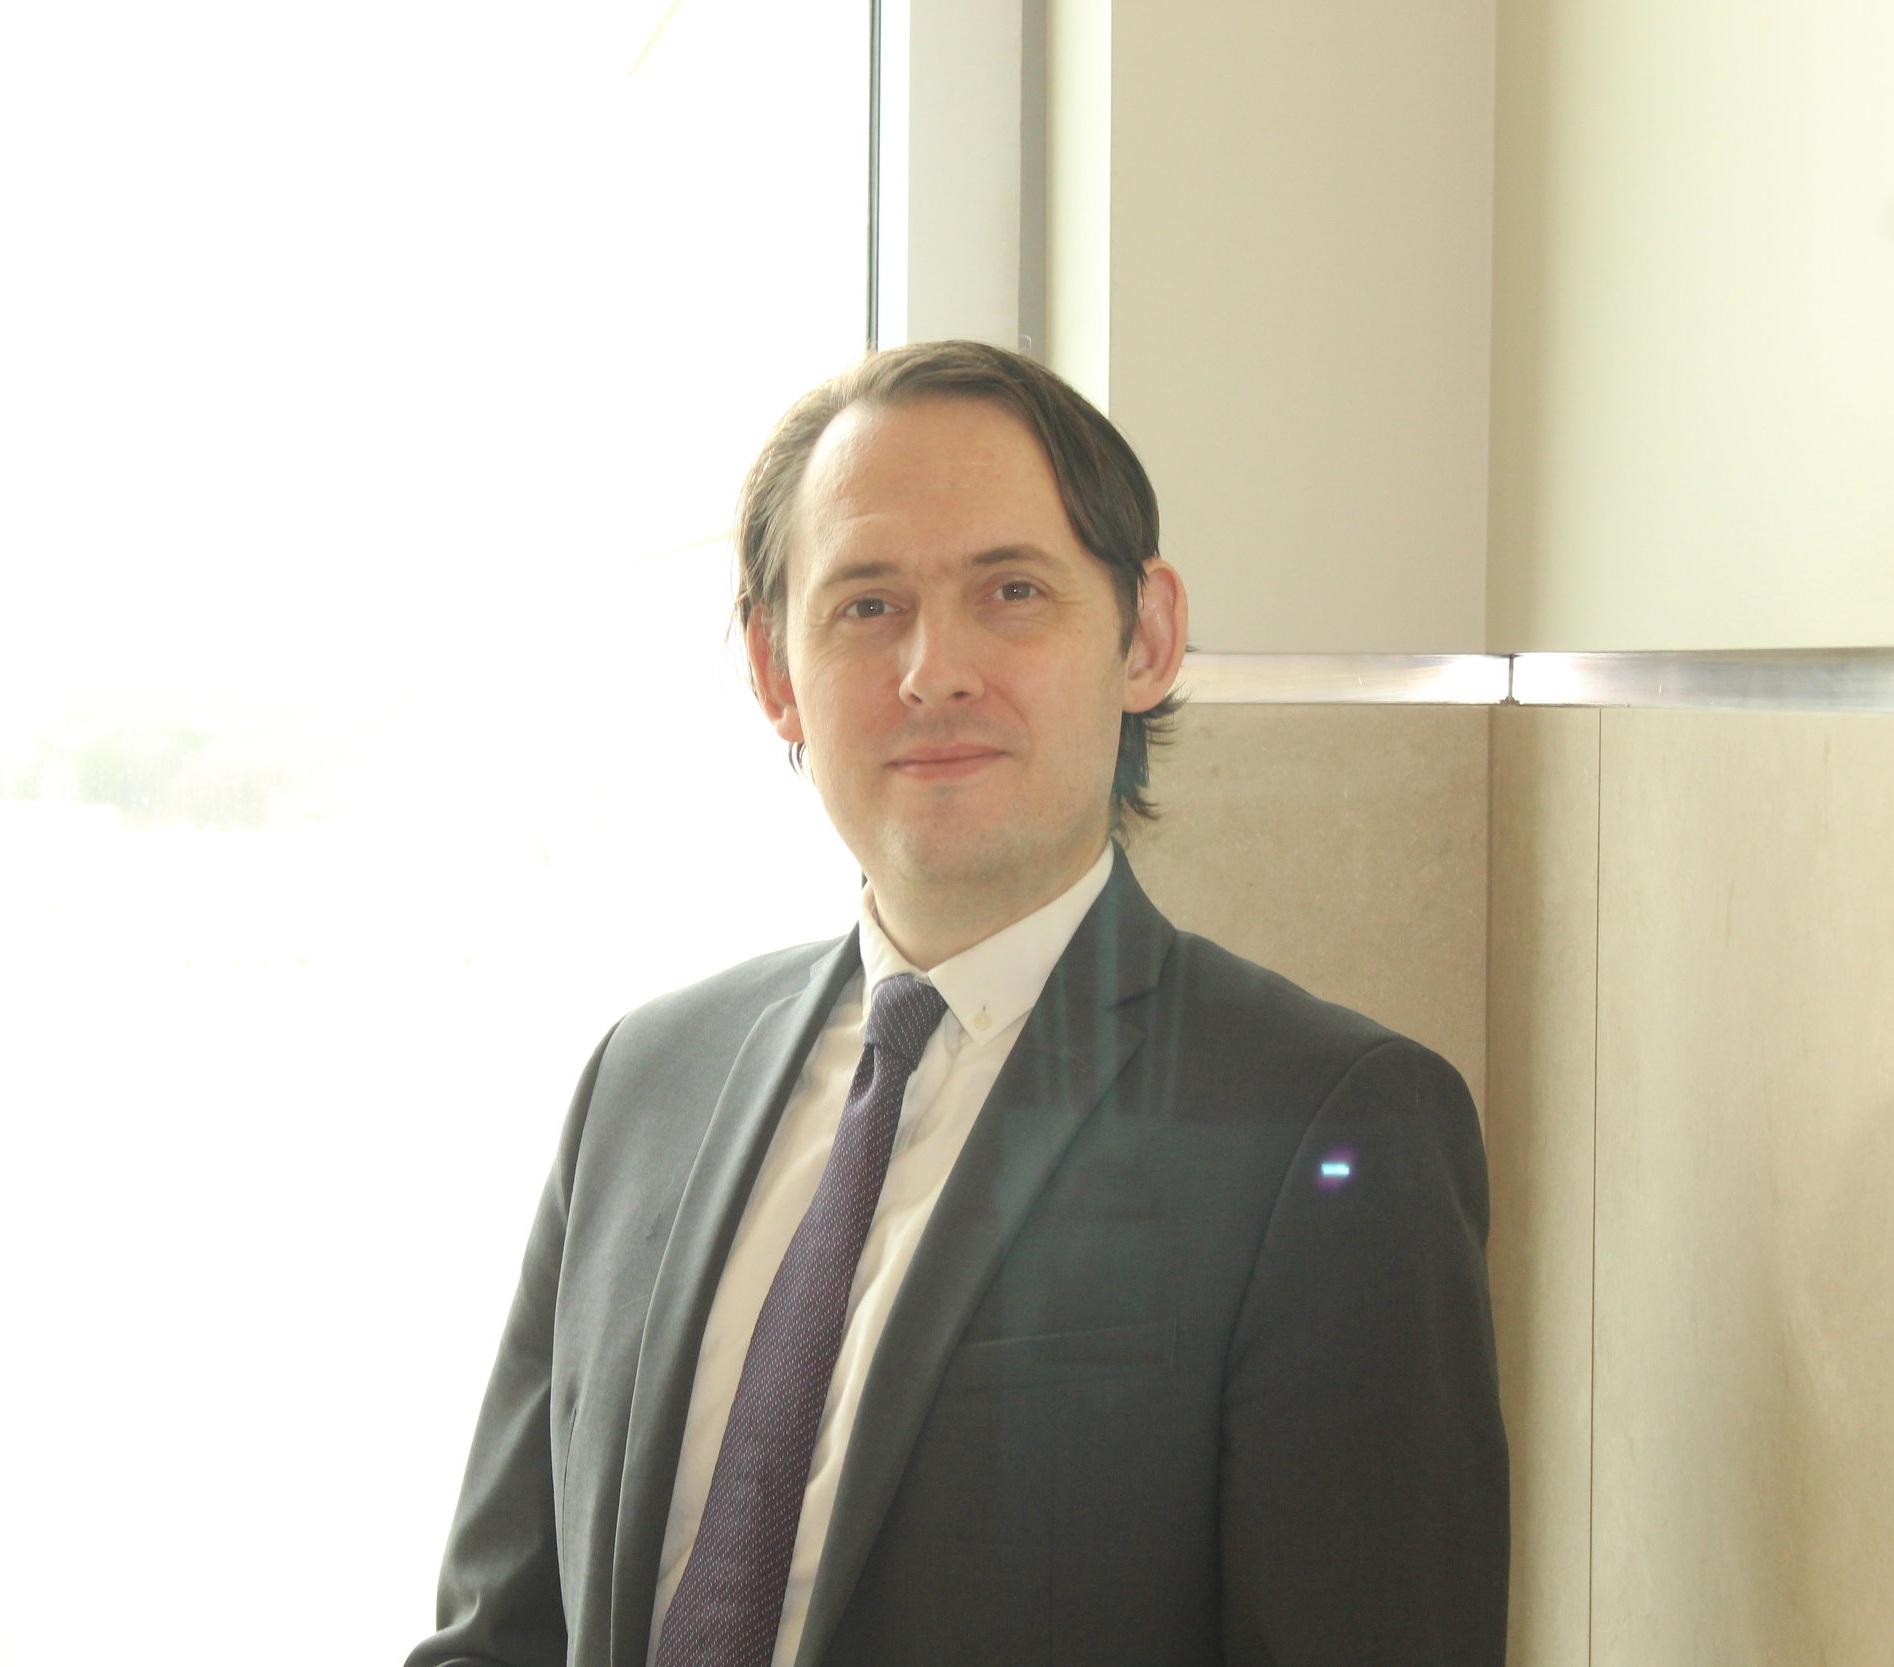 Joseph Laizure, DEAR Attorney   About Joseph